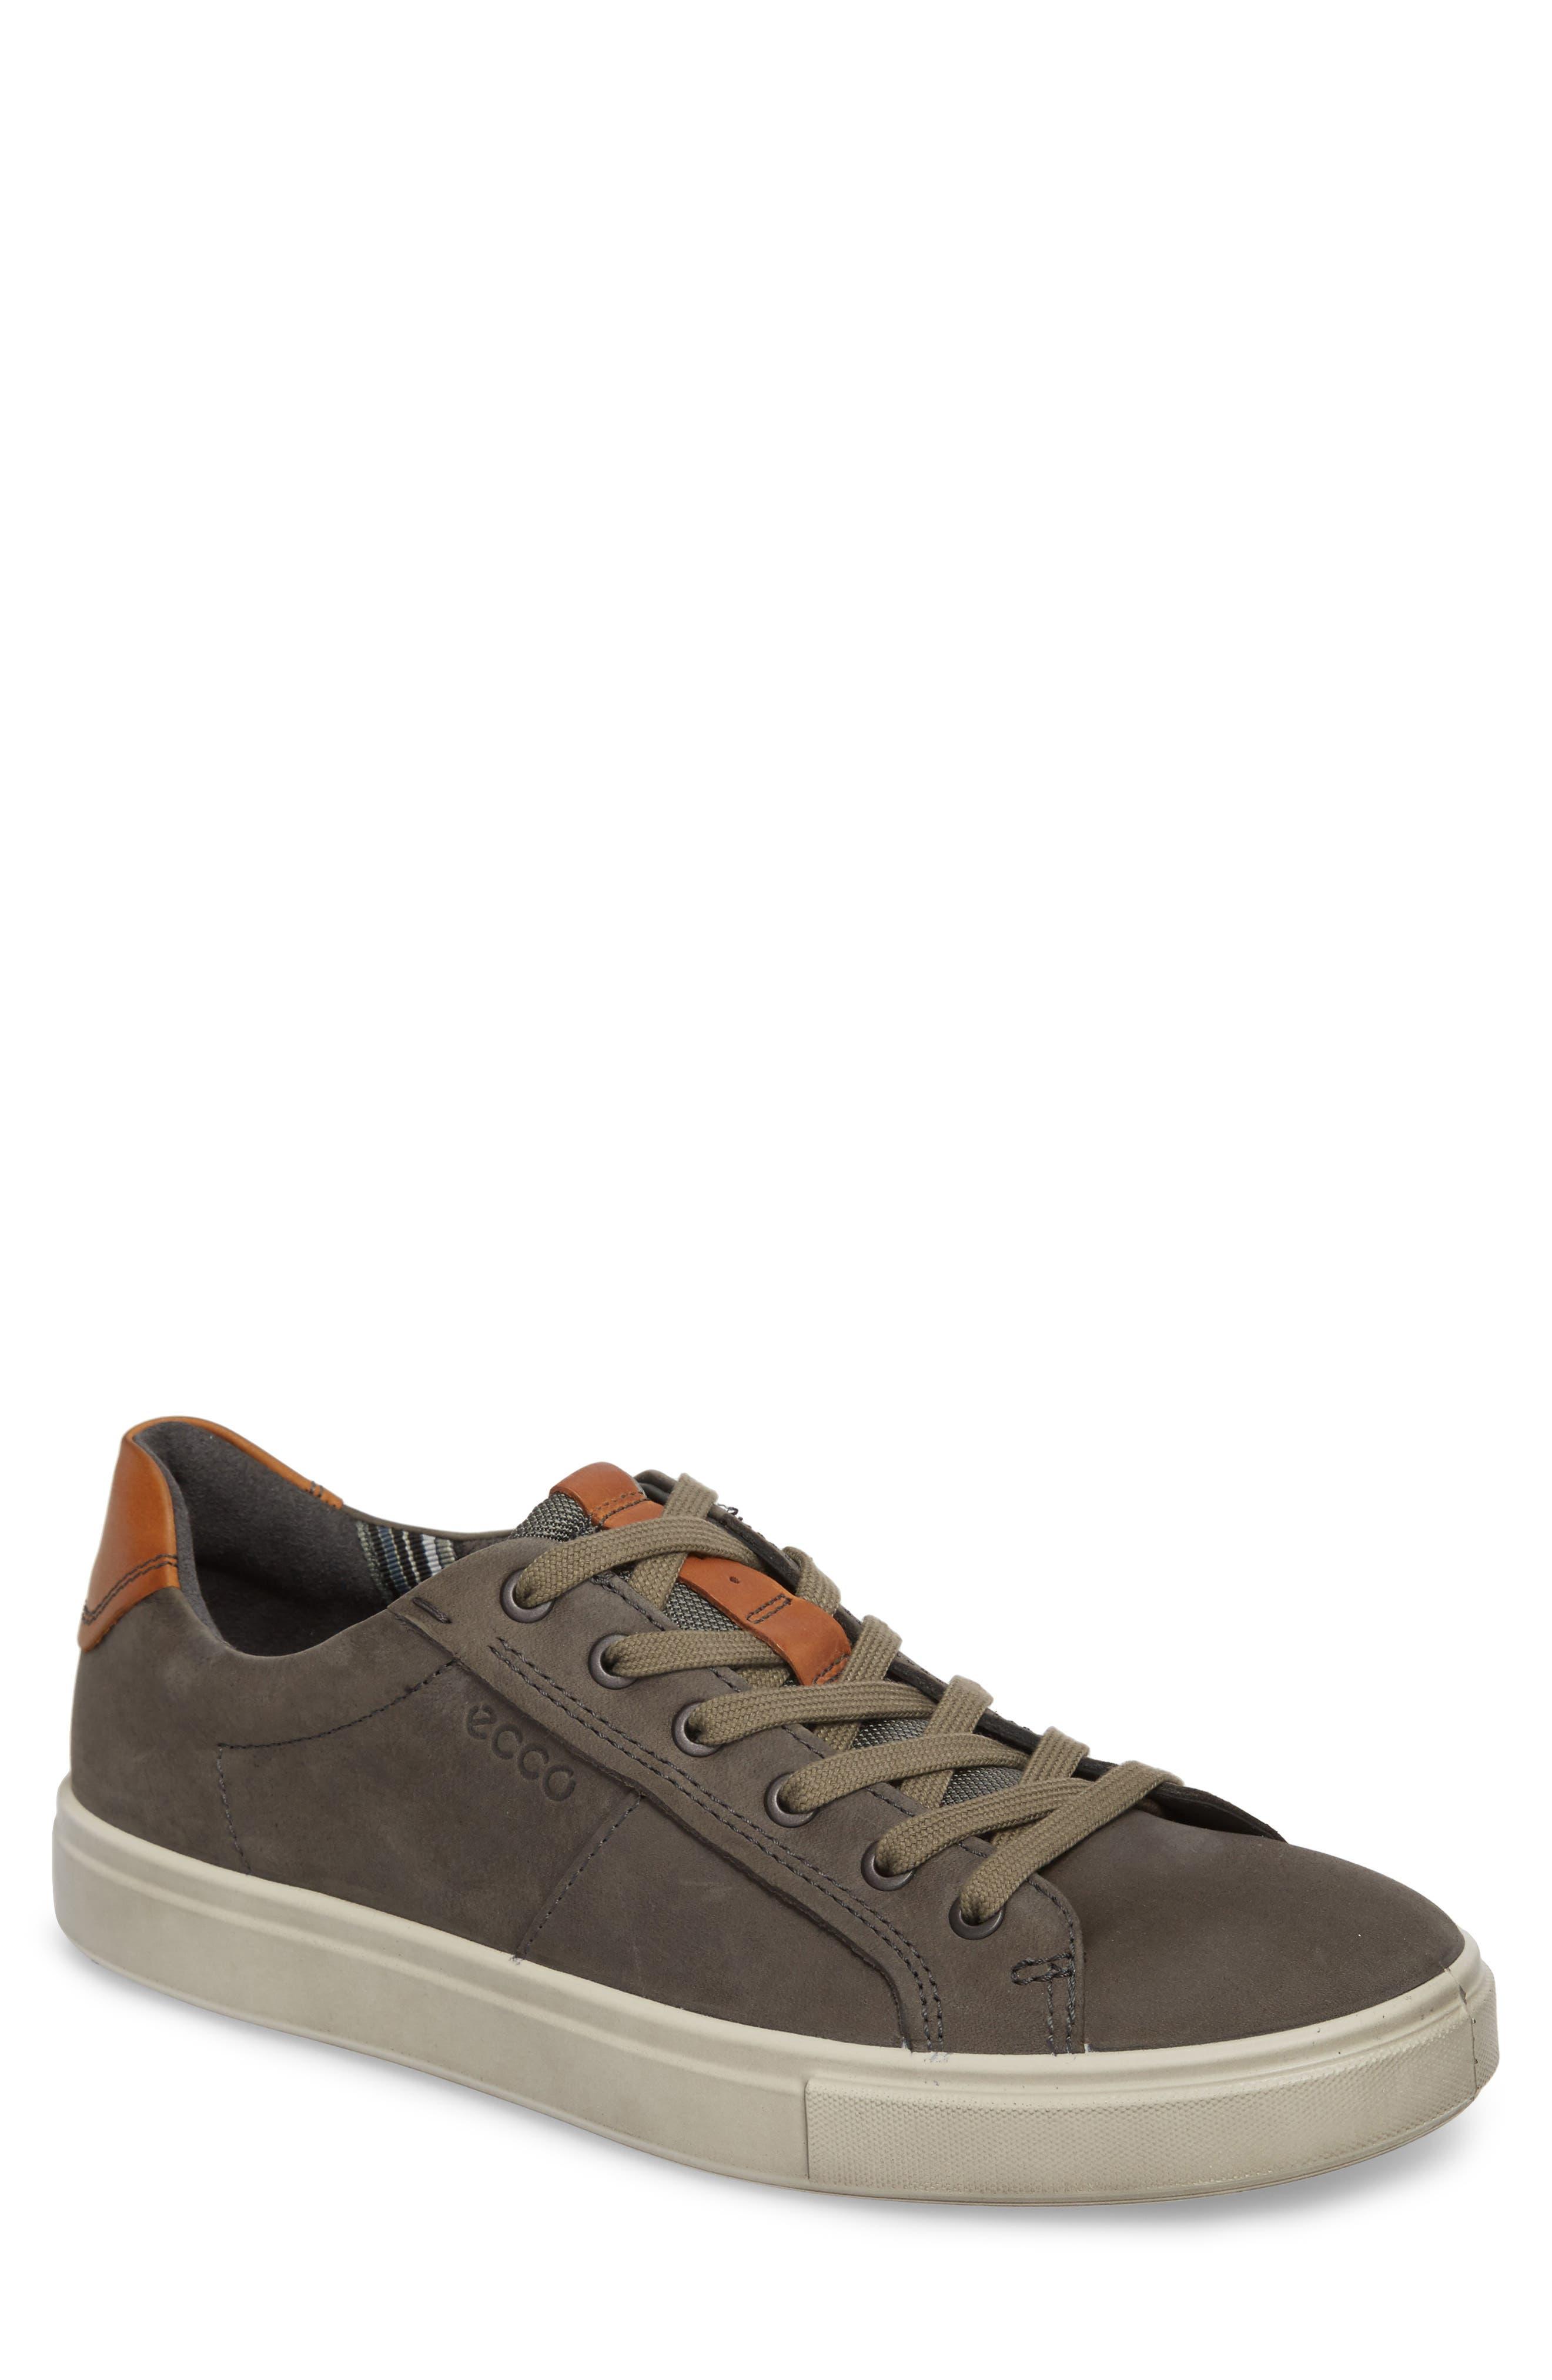 Kyle Sneaker, Main, color, 098